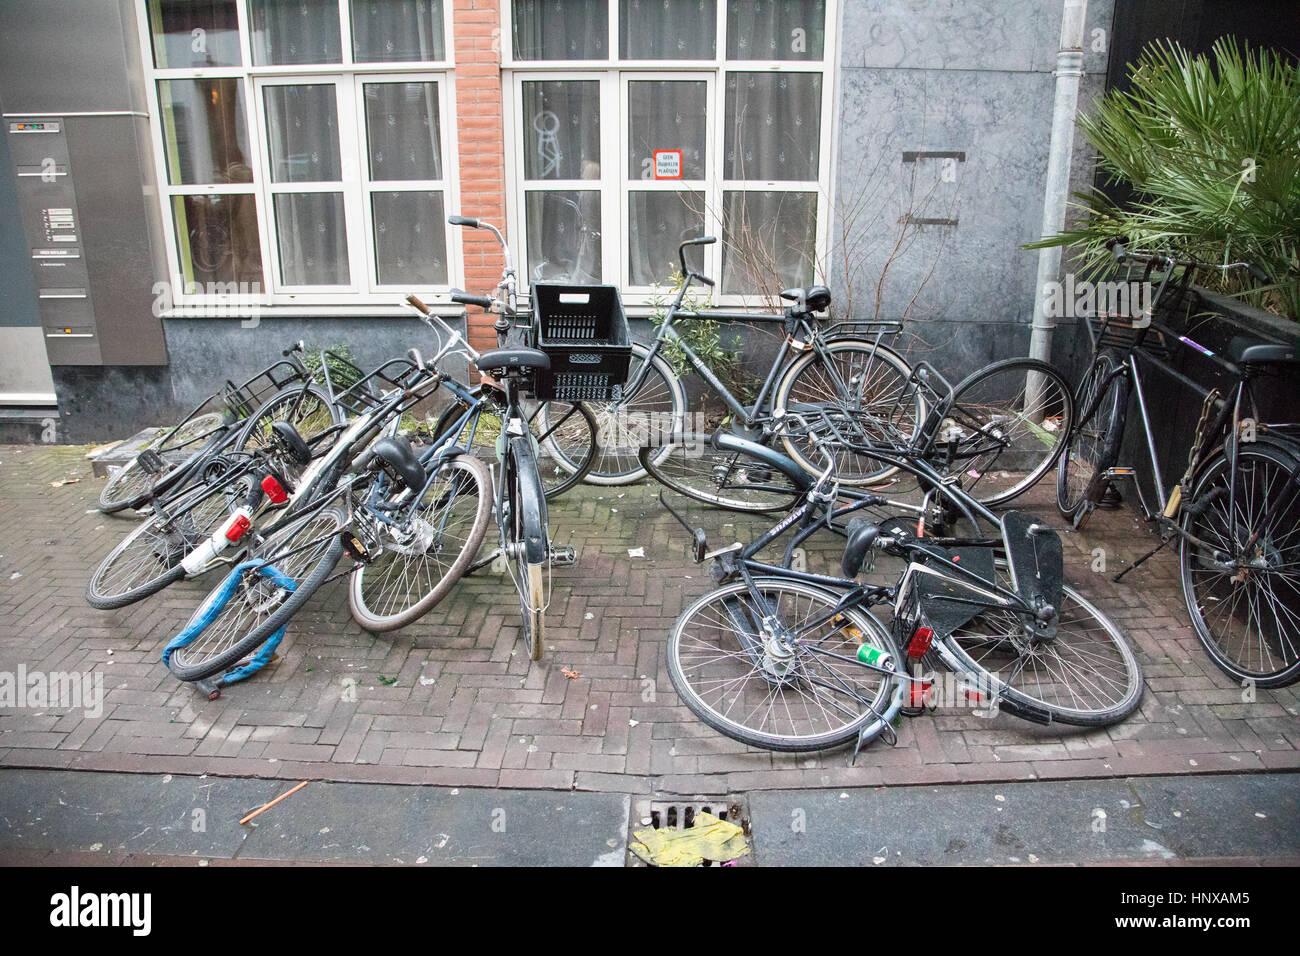 Street scene of bikes in Amsterdam, Holland. - Stock Image